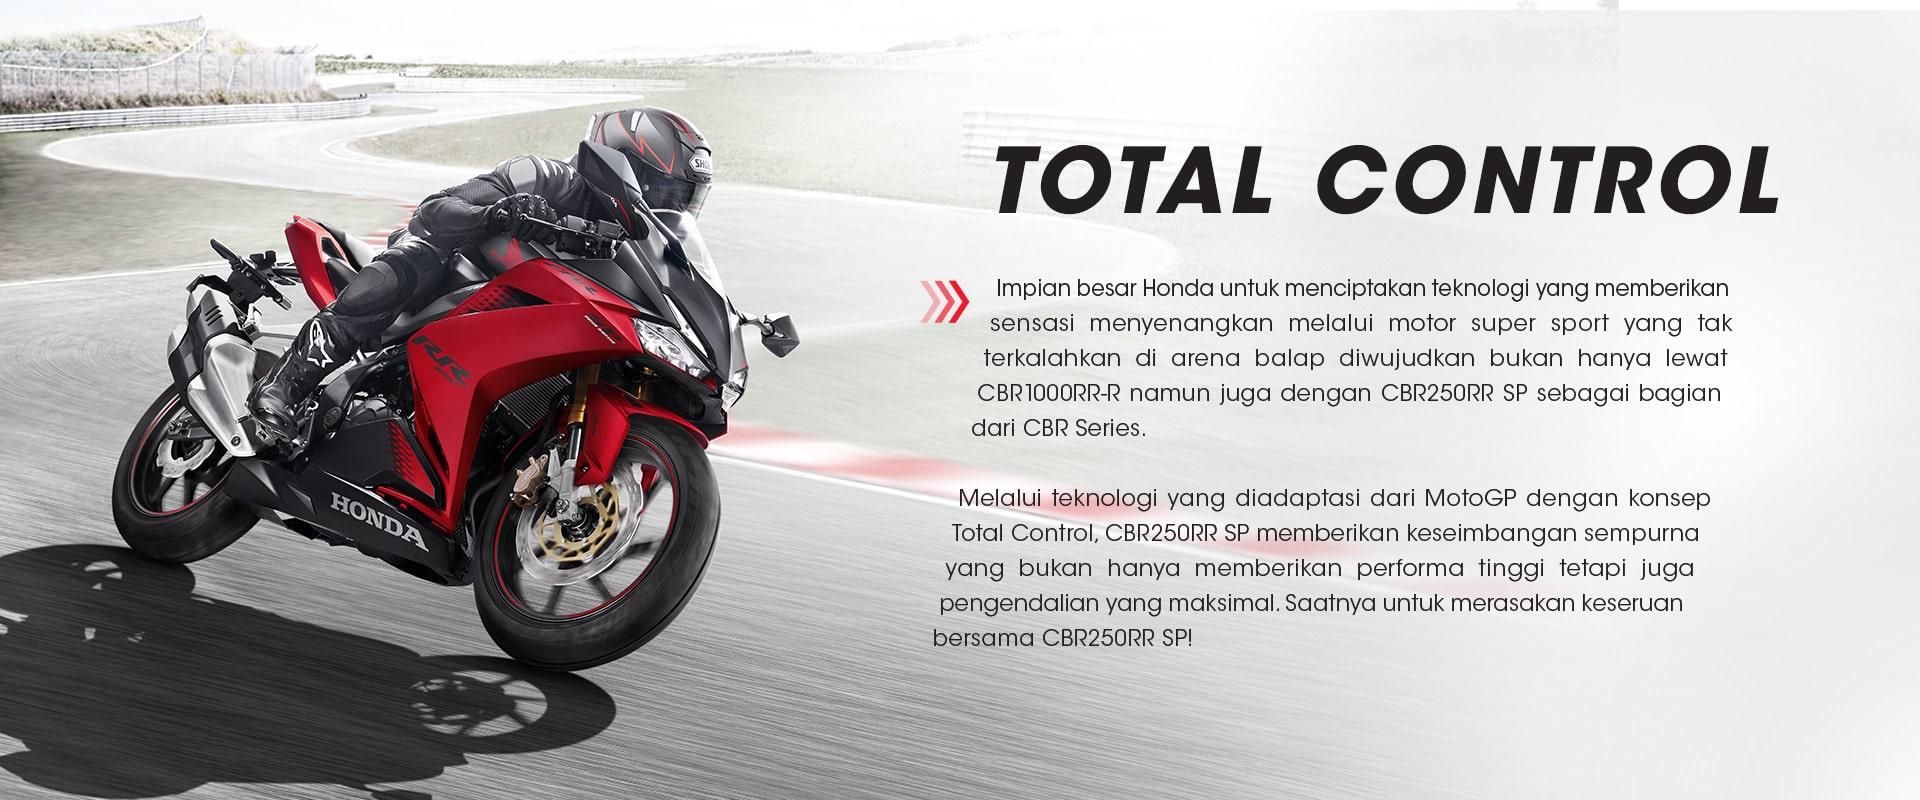 new CBR 250RR Honda cun motor